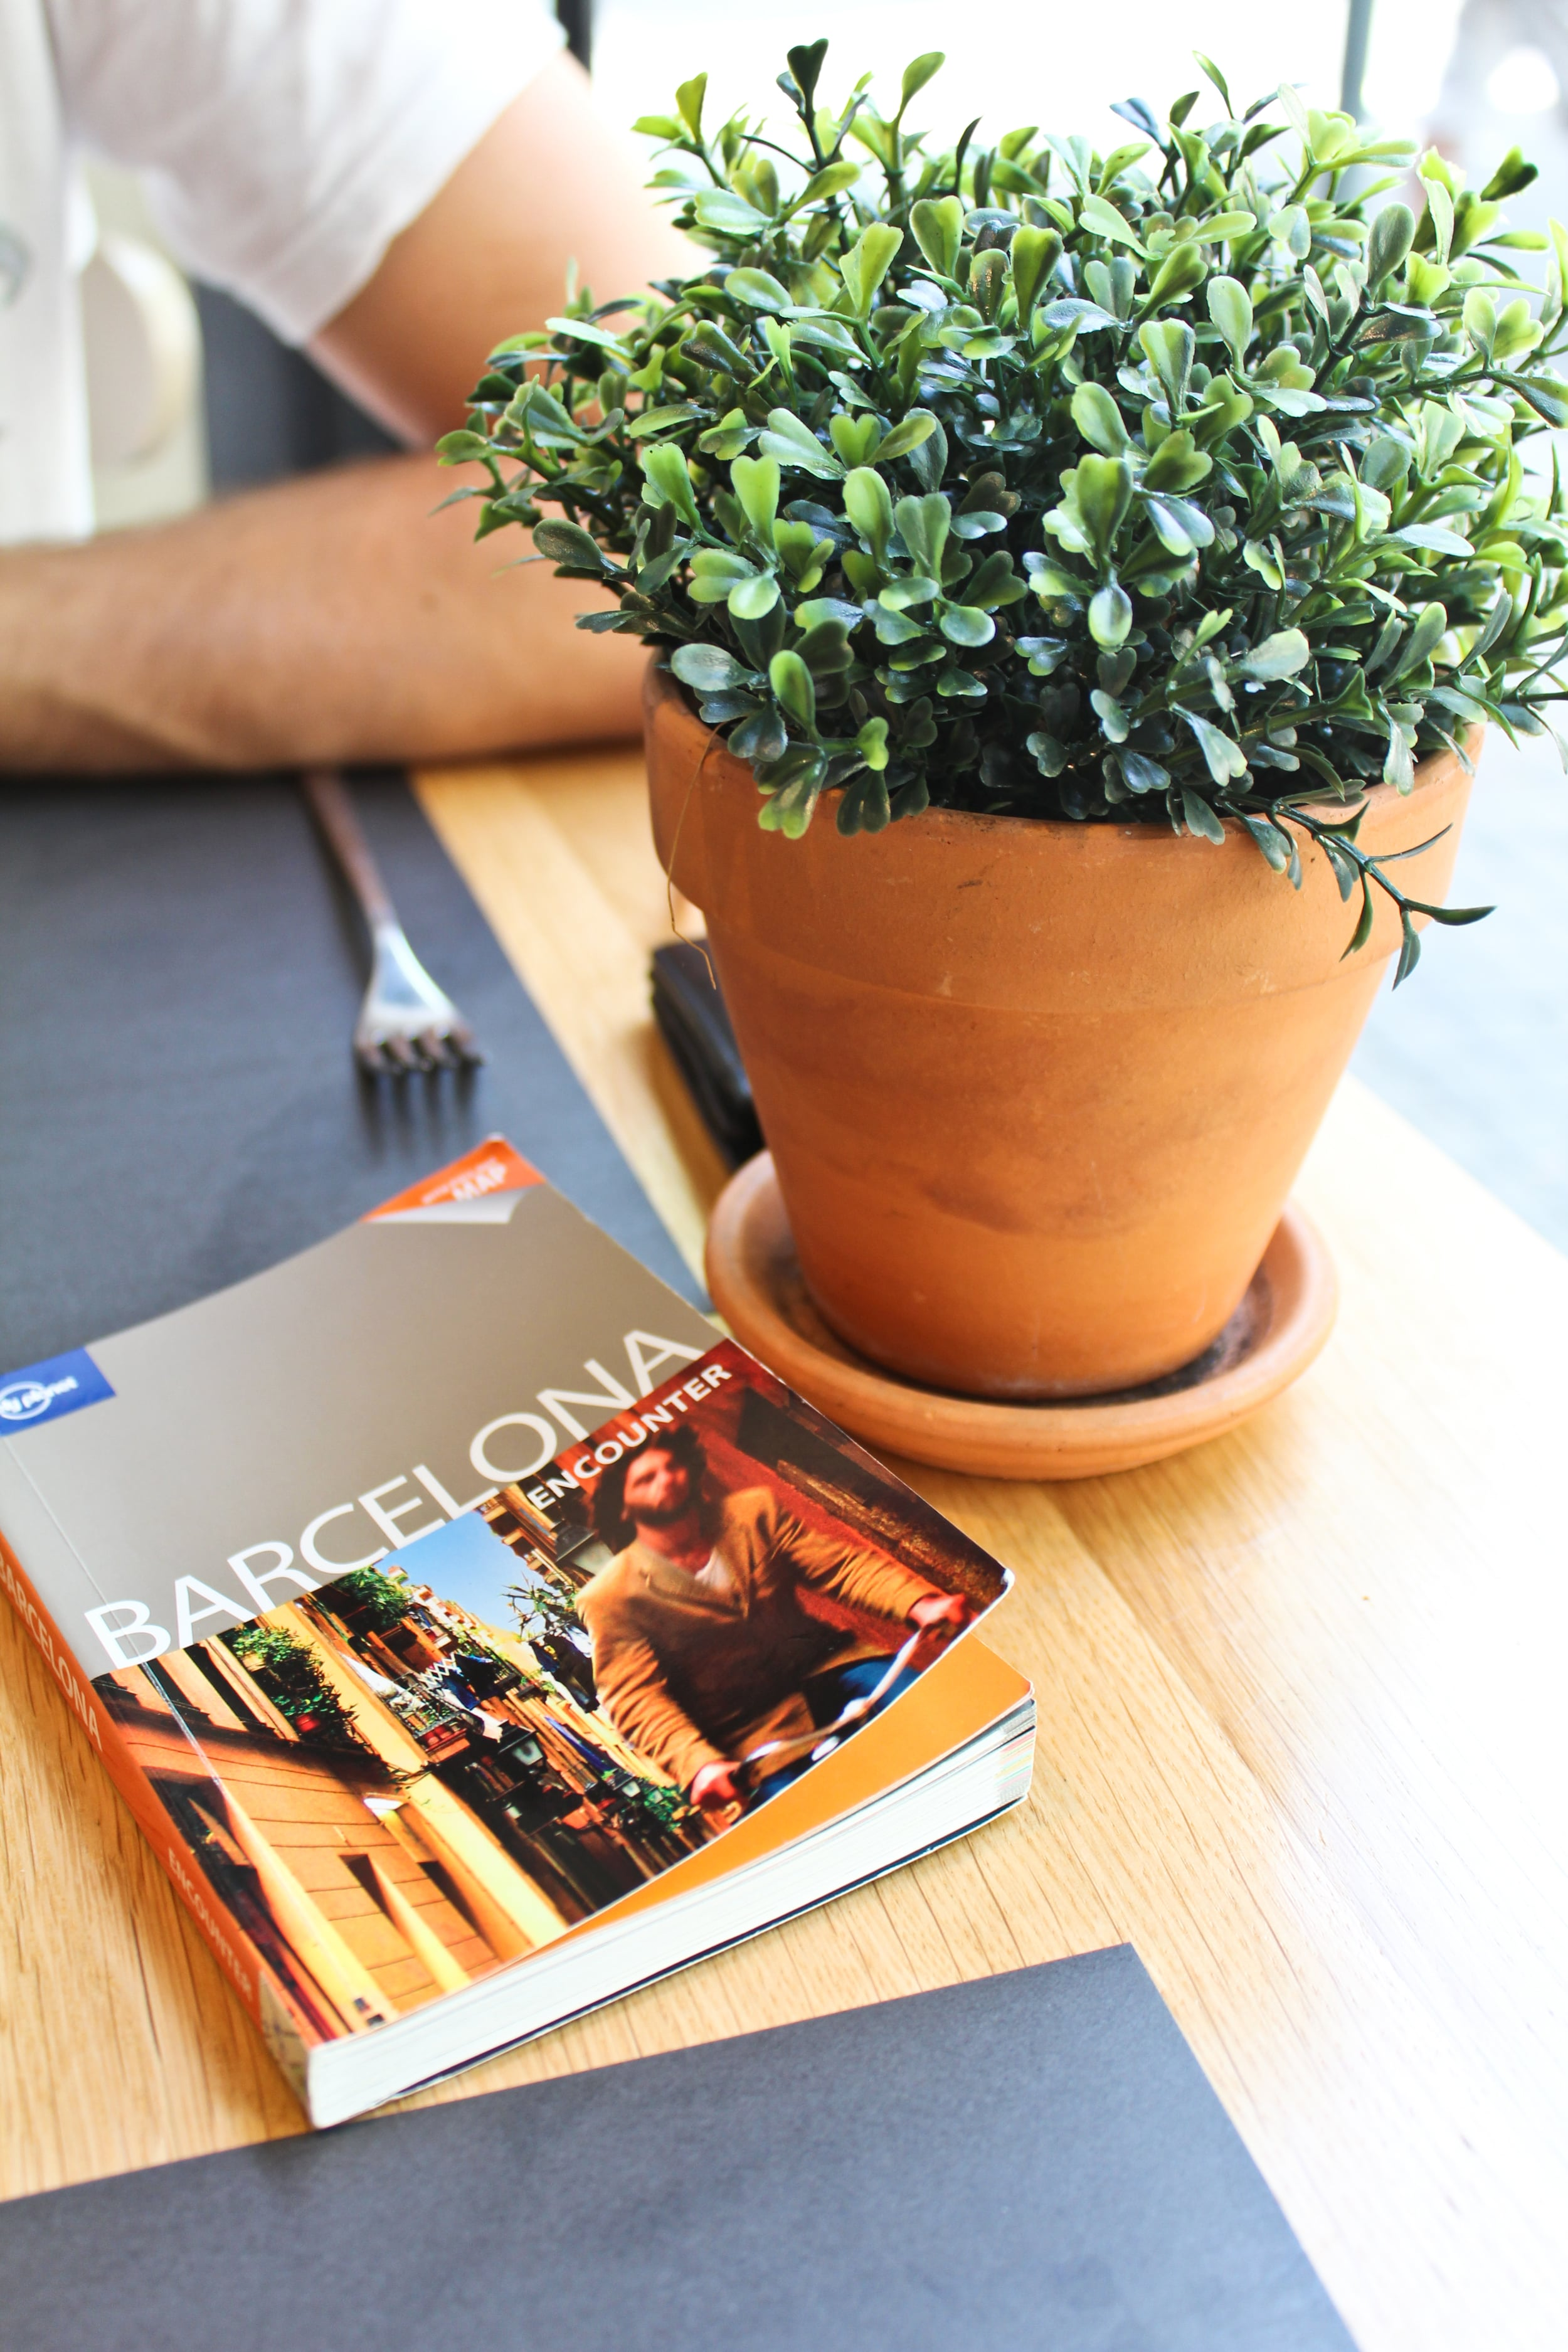 trisa-taro-barcelona-travel-guide-spain.jpg